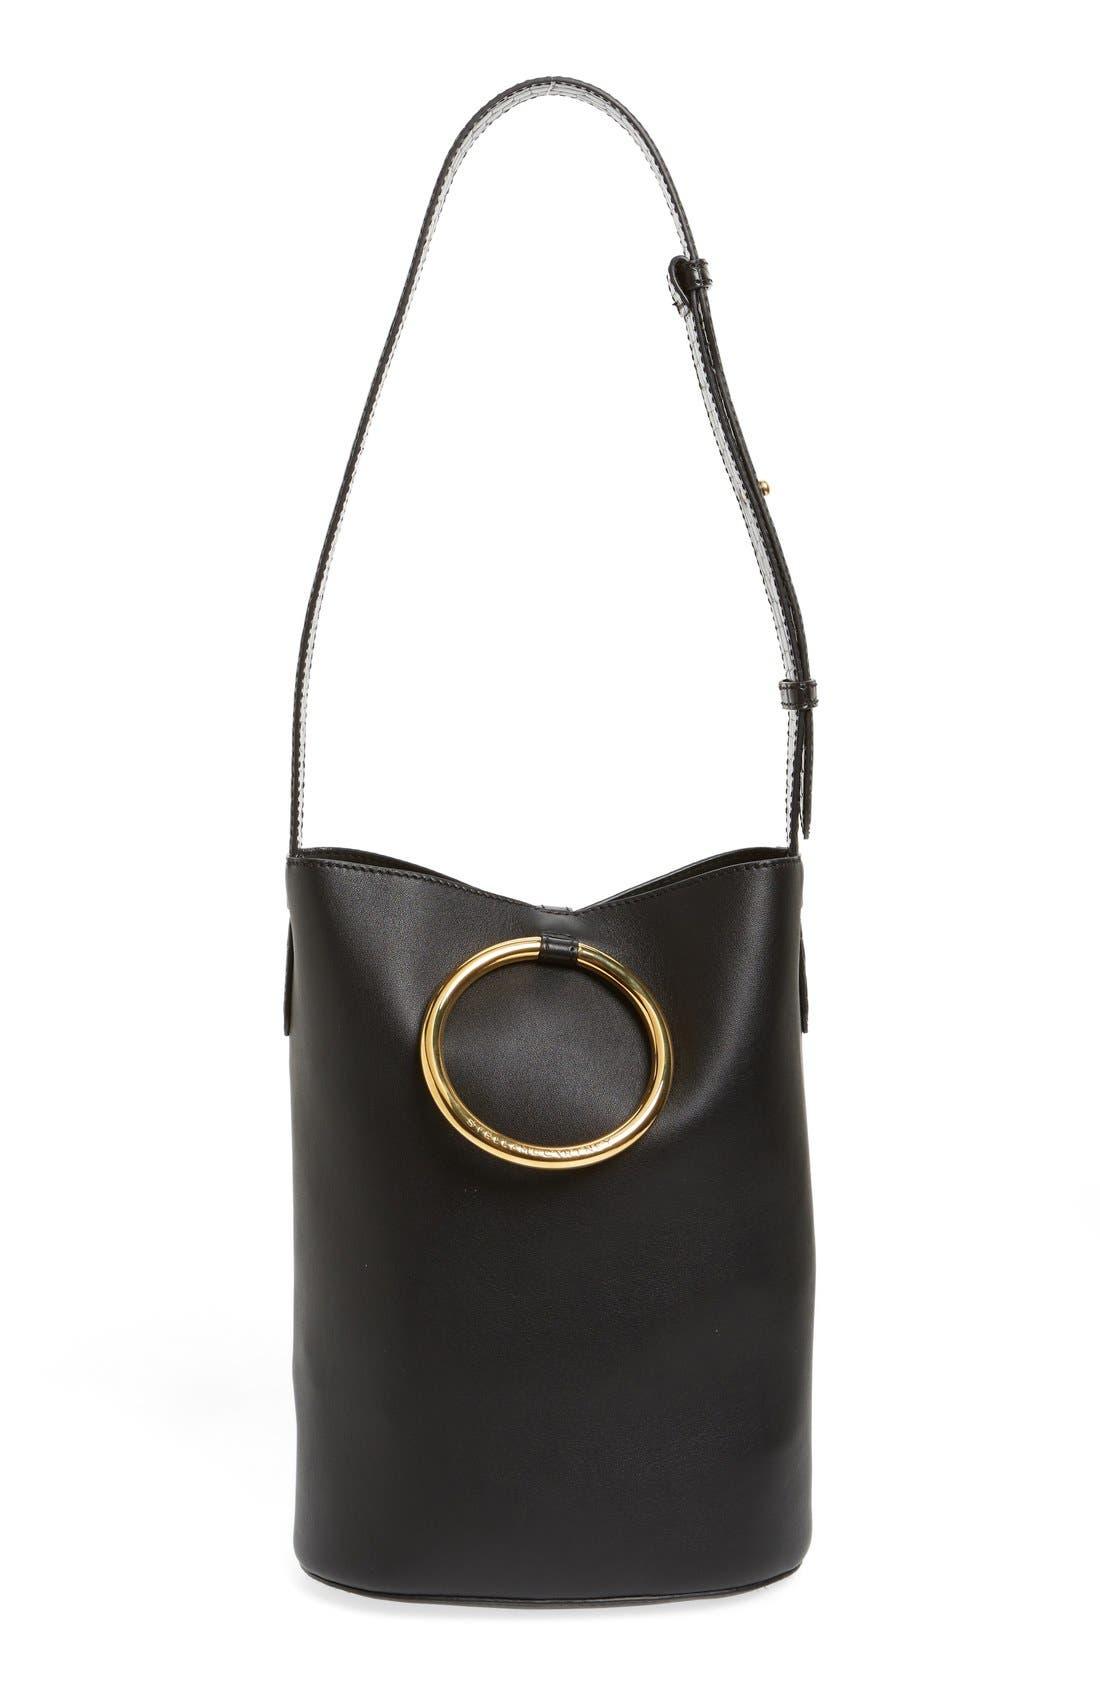 Alternate Image 1 Selected - Stella McCartney 'Medium Ring' Faux Nappa Leather Bucket Bag